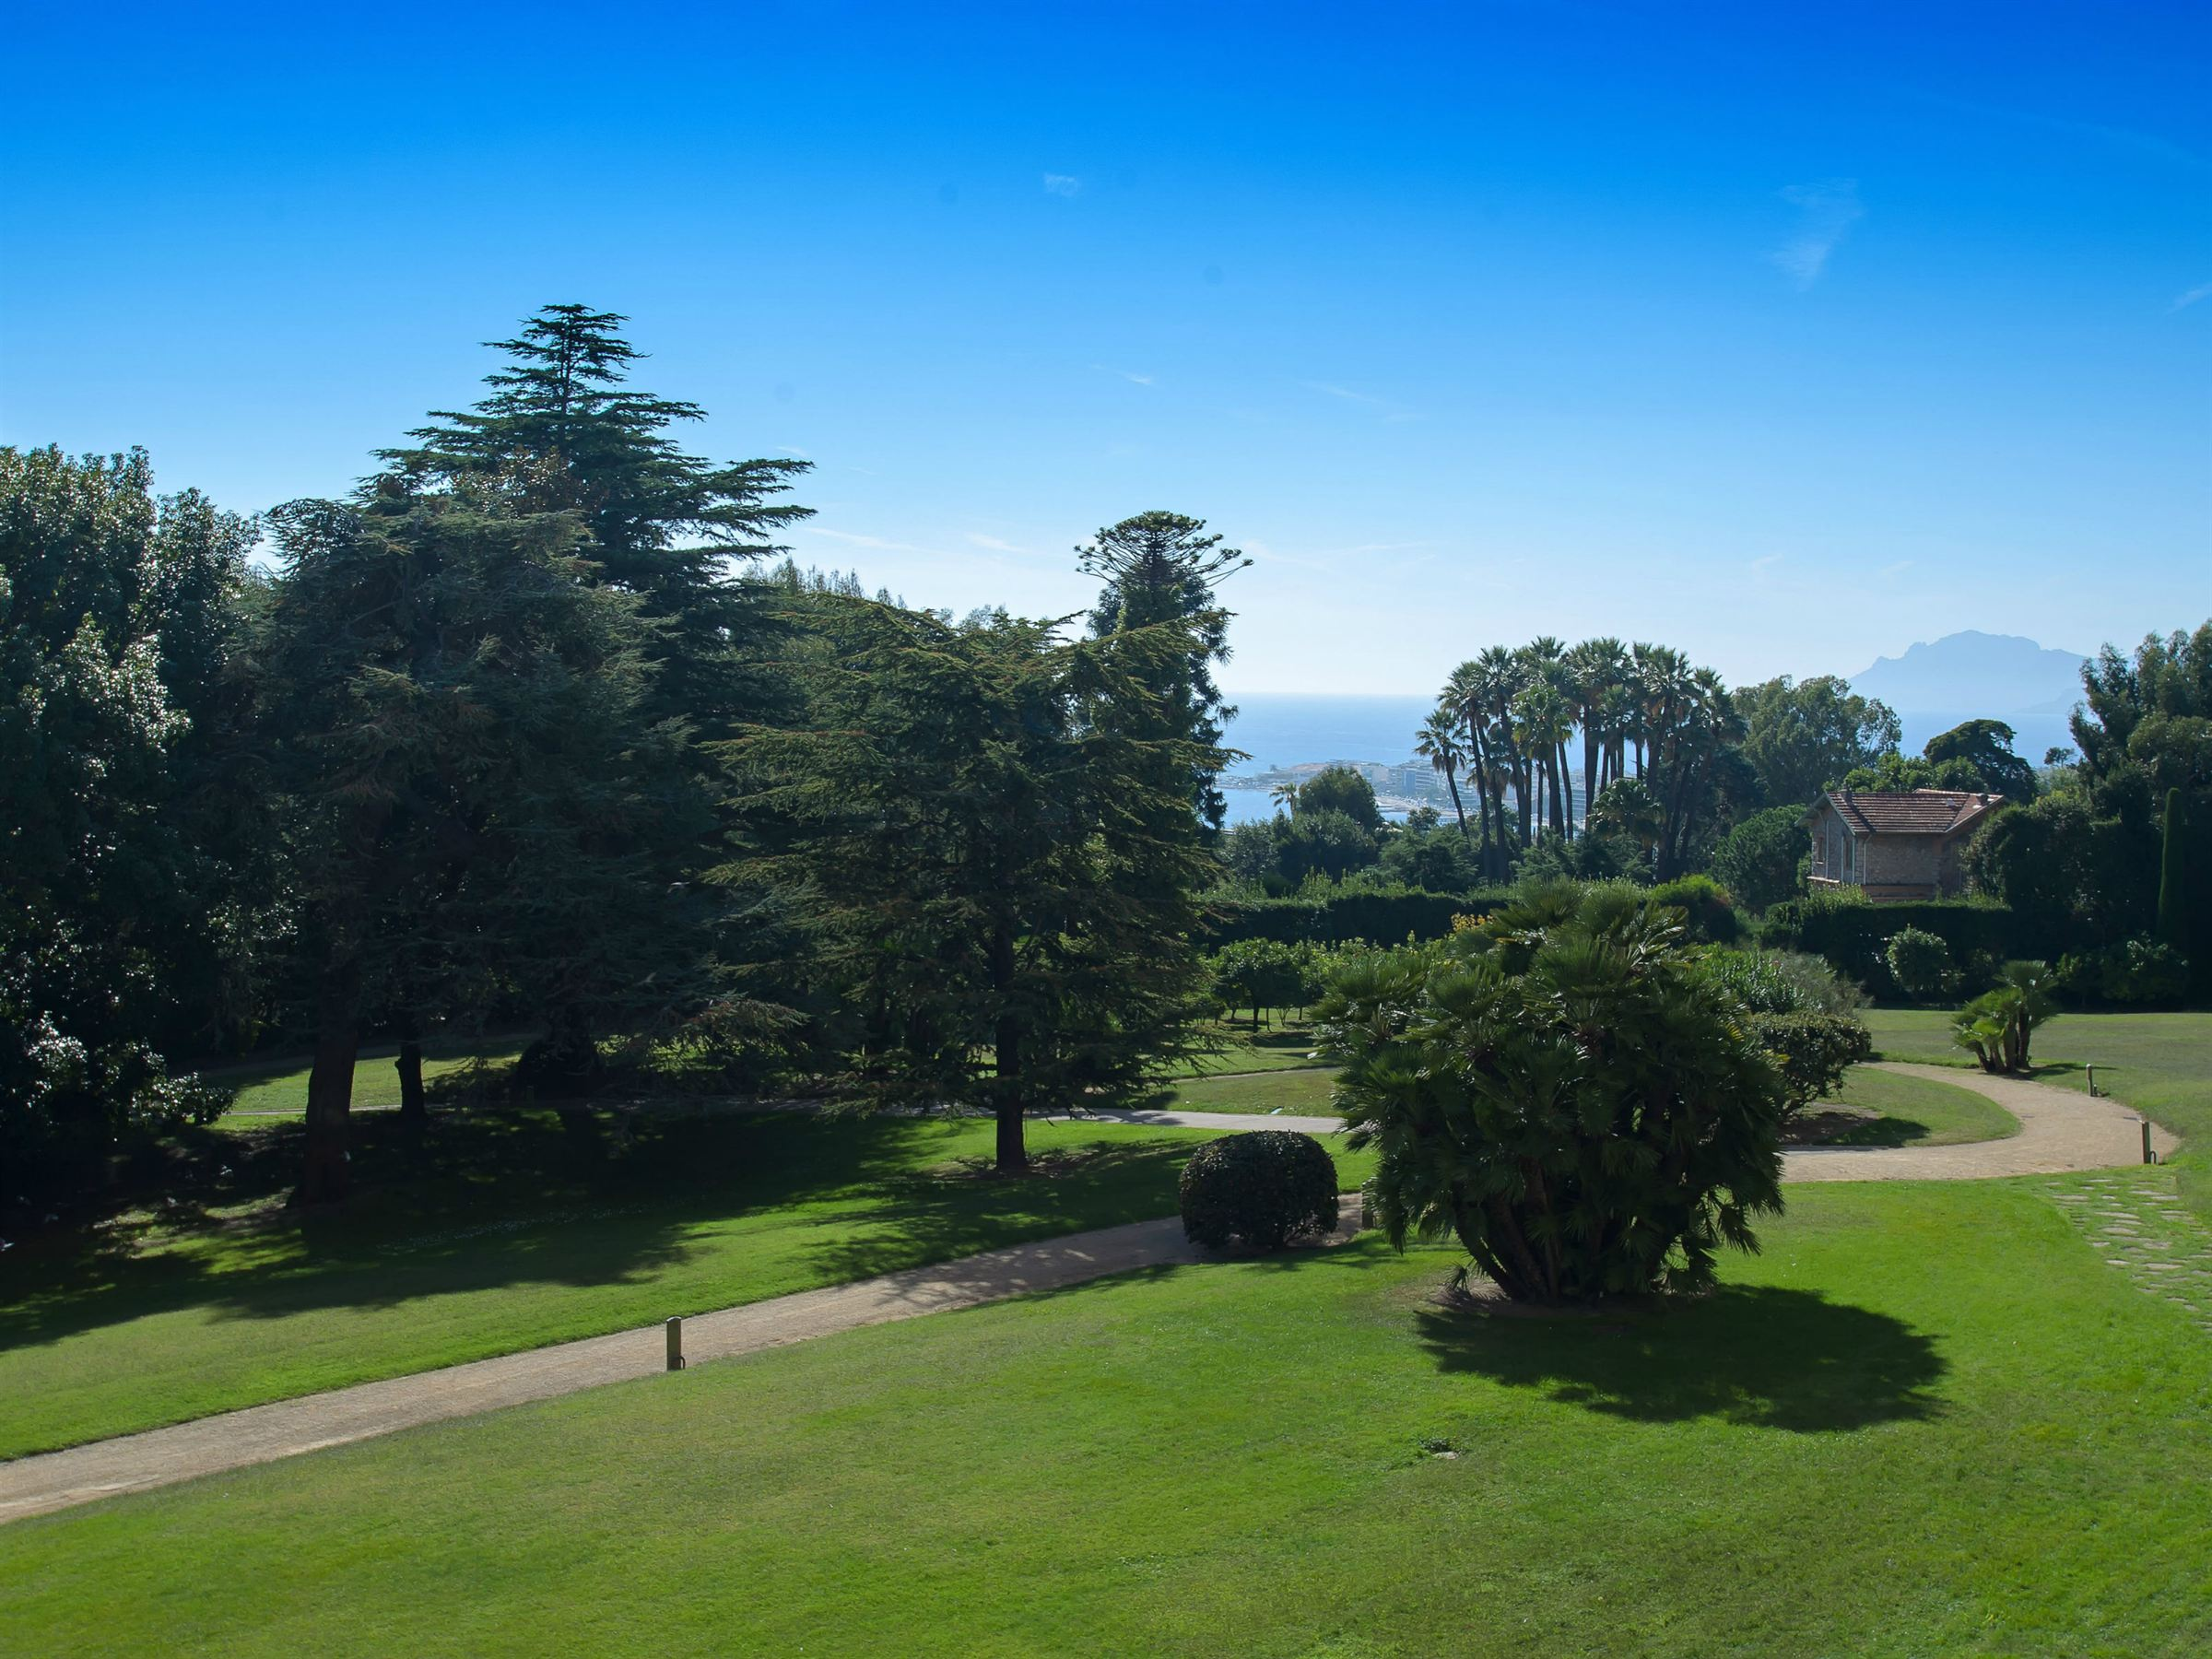 公寓 为 销售 在 Cannes Californie, upscale 2 bedrooms apartment for sale 坎尼, 普罗旺斯阿尔卑斯蓝色海岸, 06400 法国